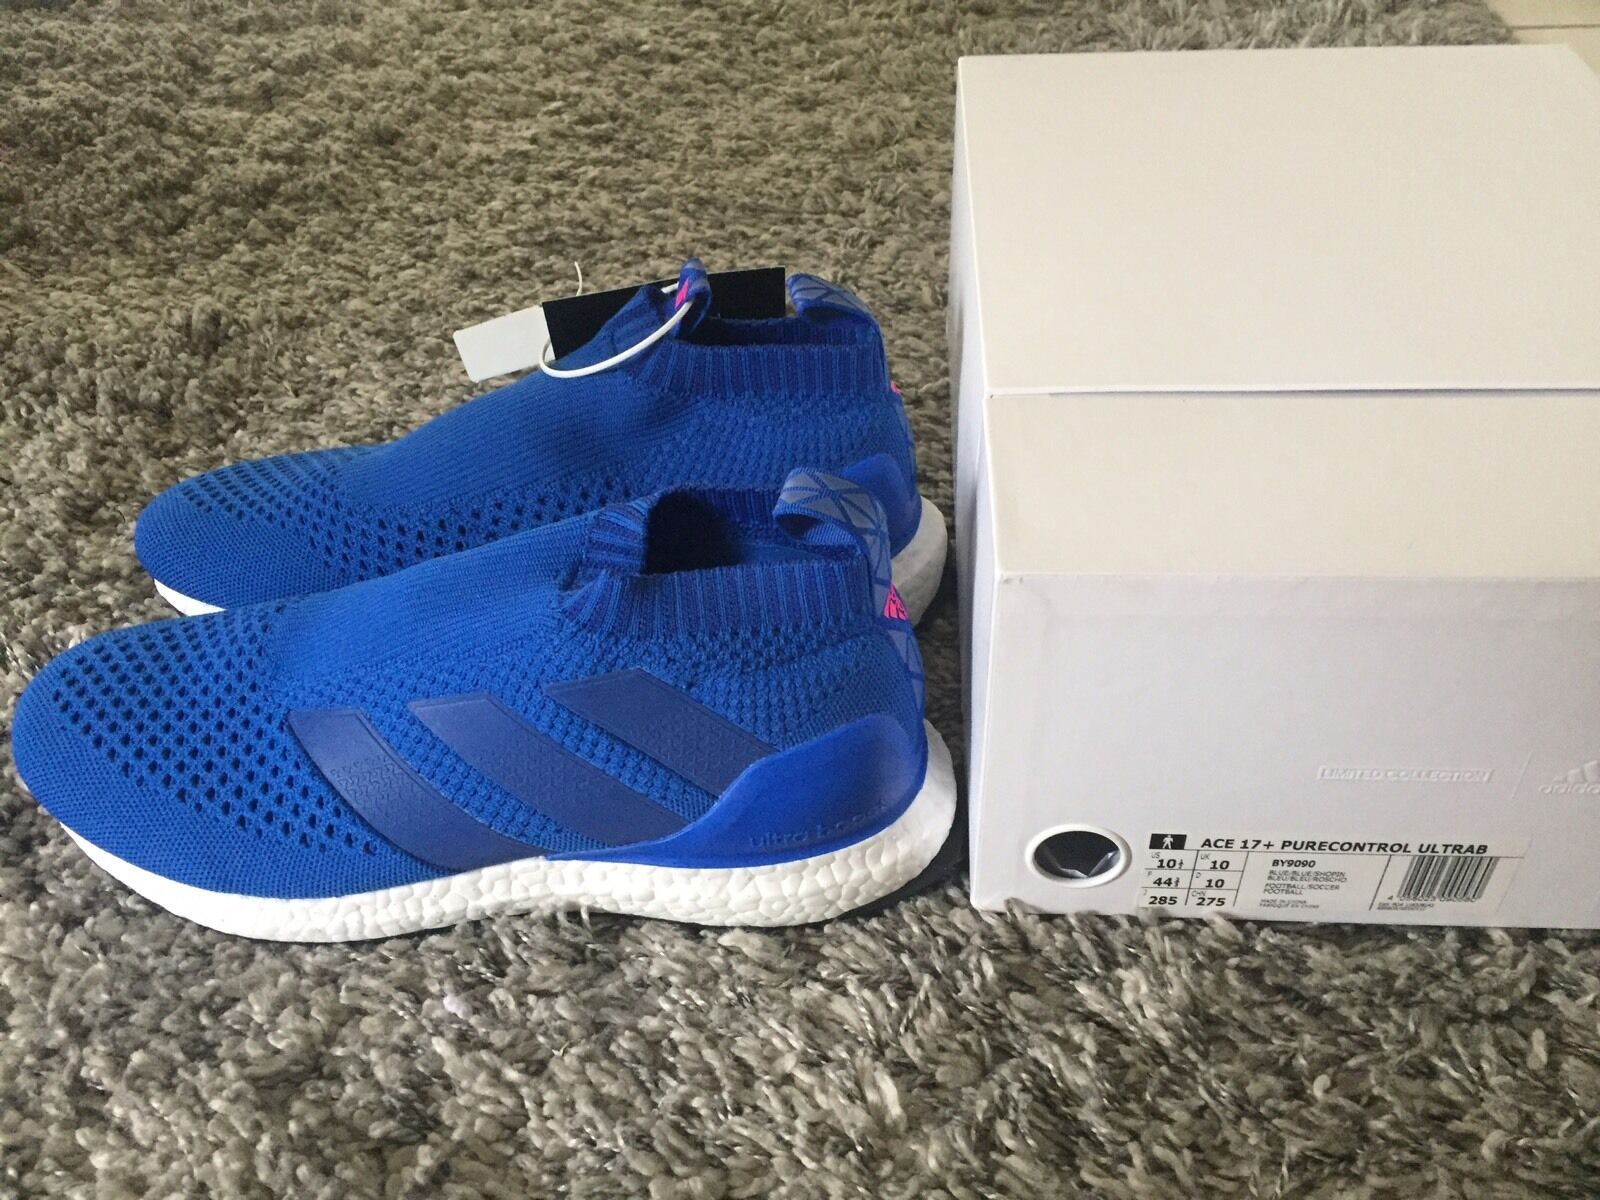 Adidas Ace 16 + 17+ Purecontrol US10.5 UK10 EU44.5 Ultra boost bleu pure control